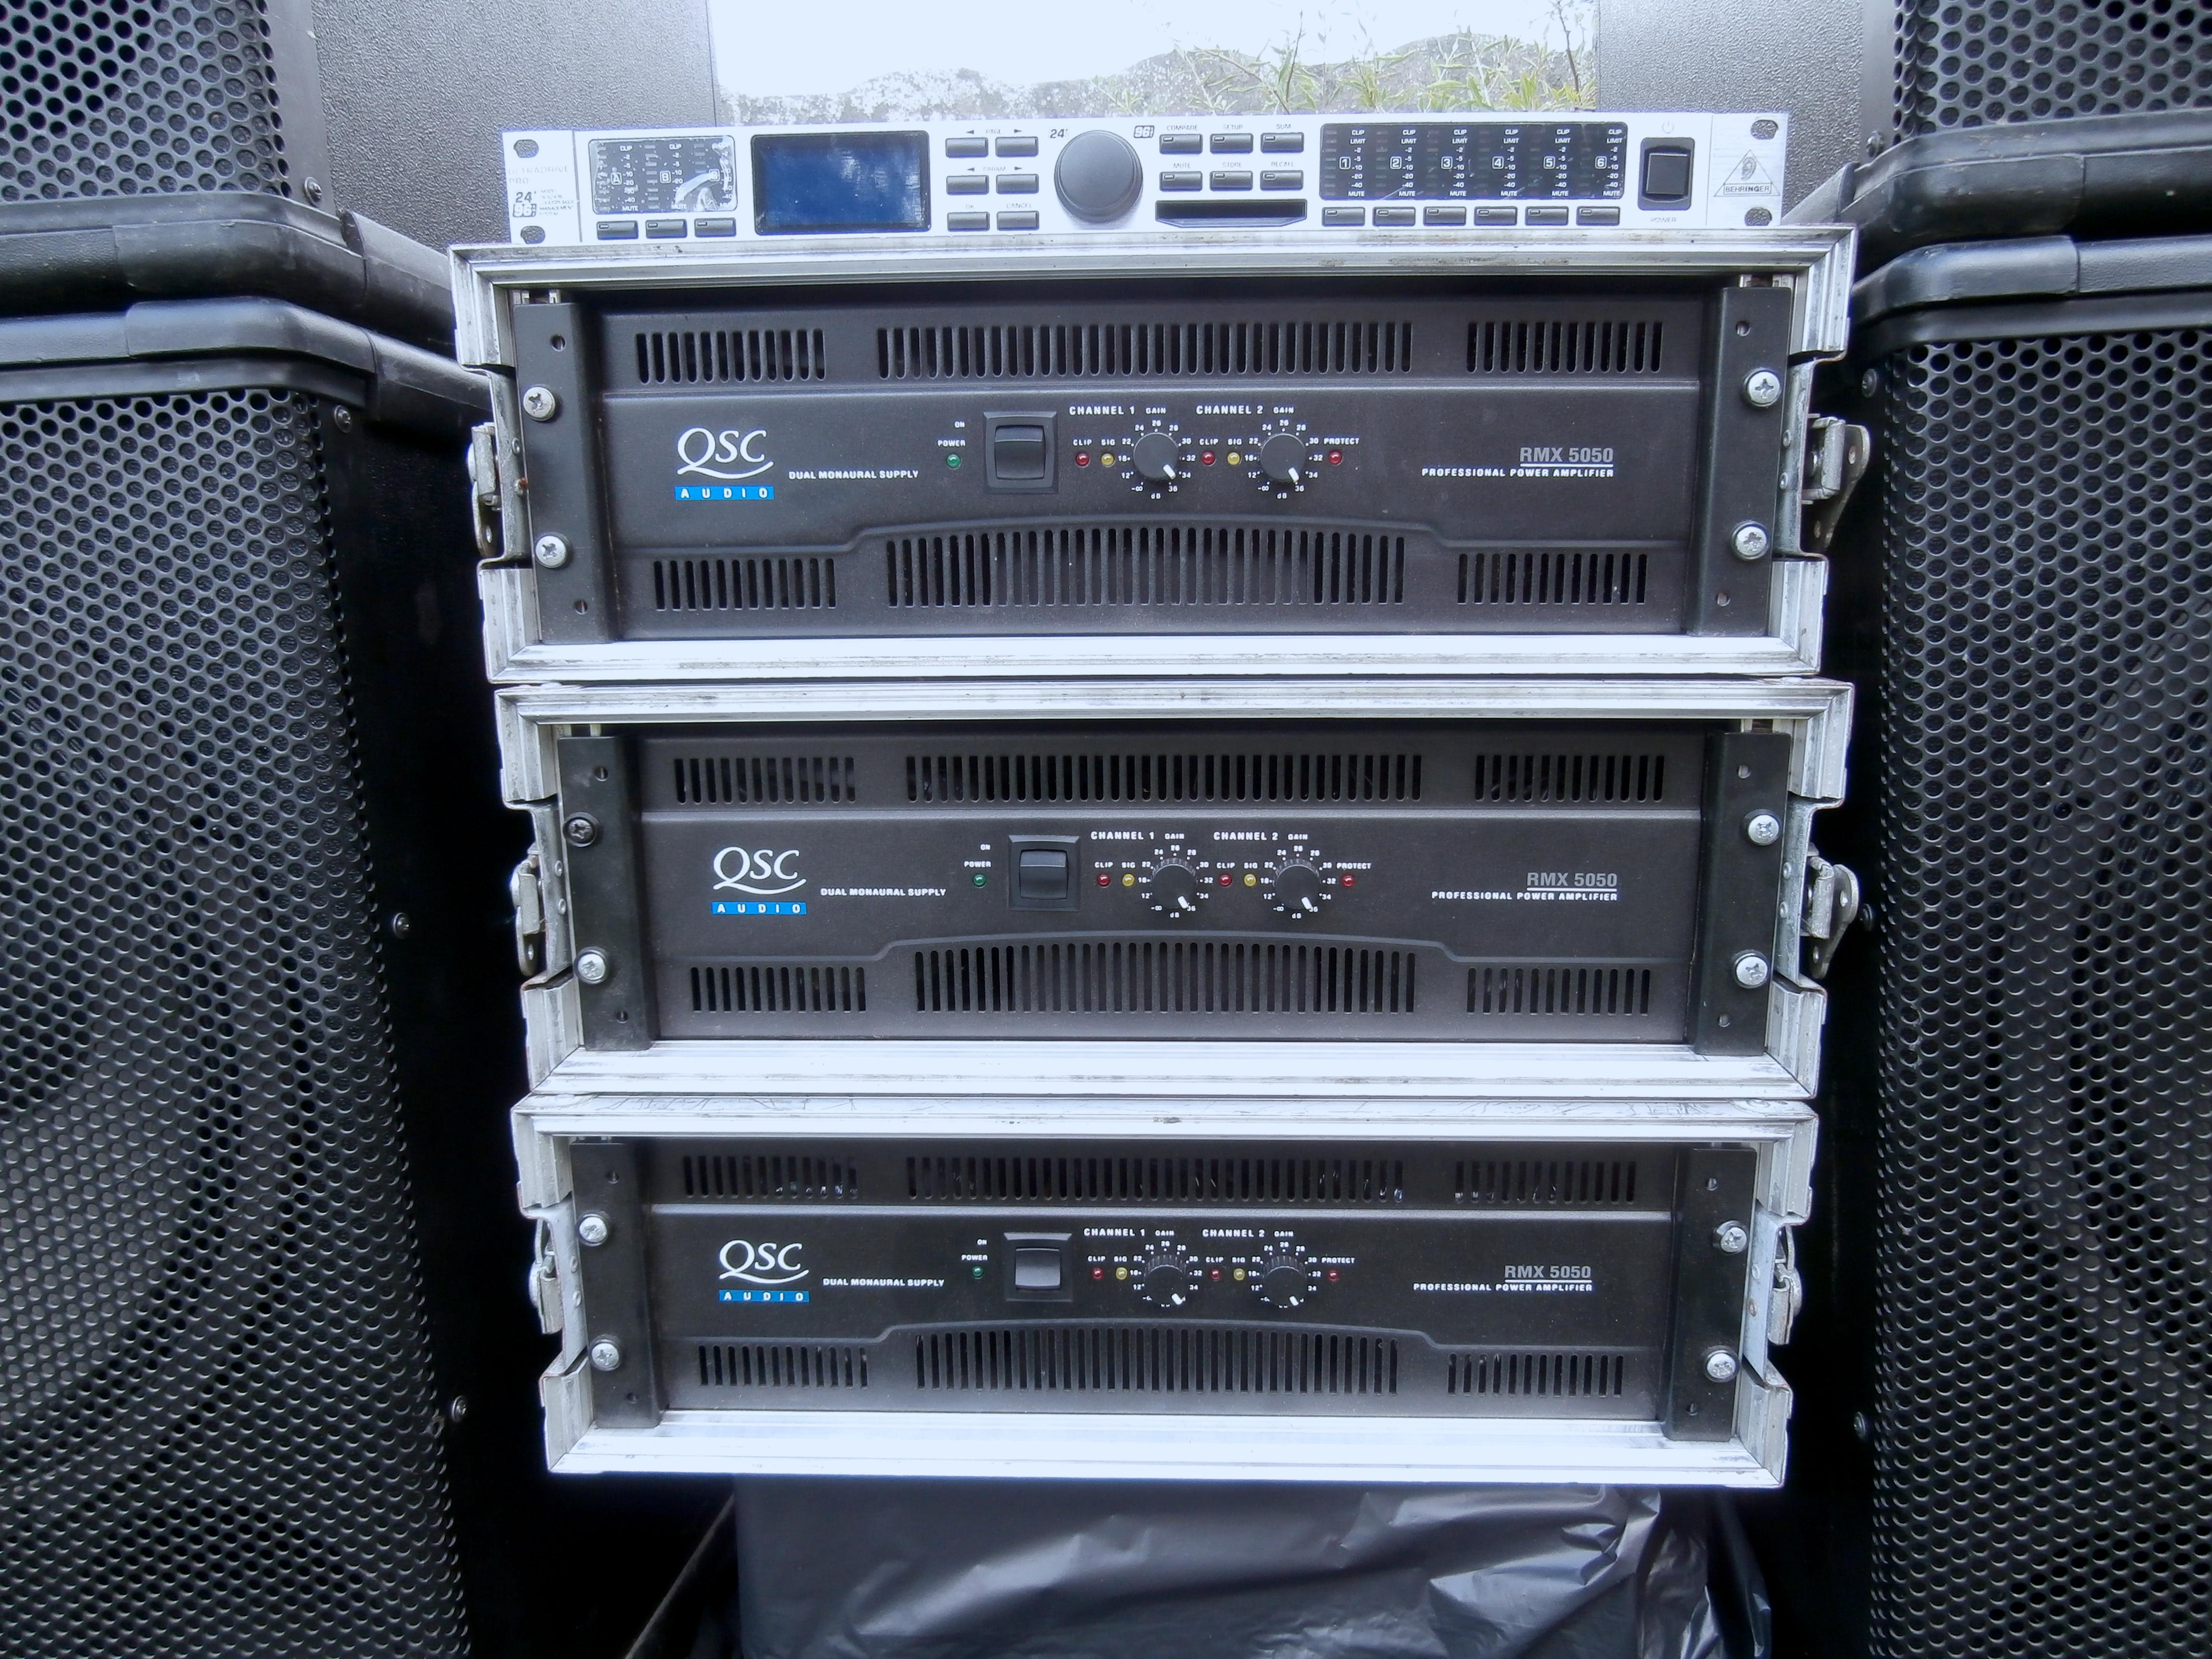 Power Amplifier Qsc 5050 : qsc rmx 5050 image 889299 audiofanzine ~ Vivirlamusica.com Haus und Dekorationen